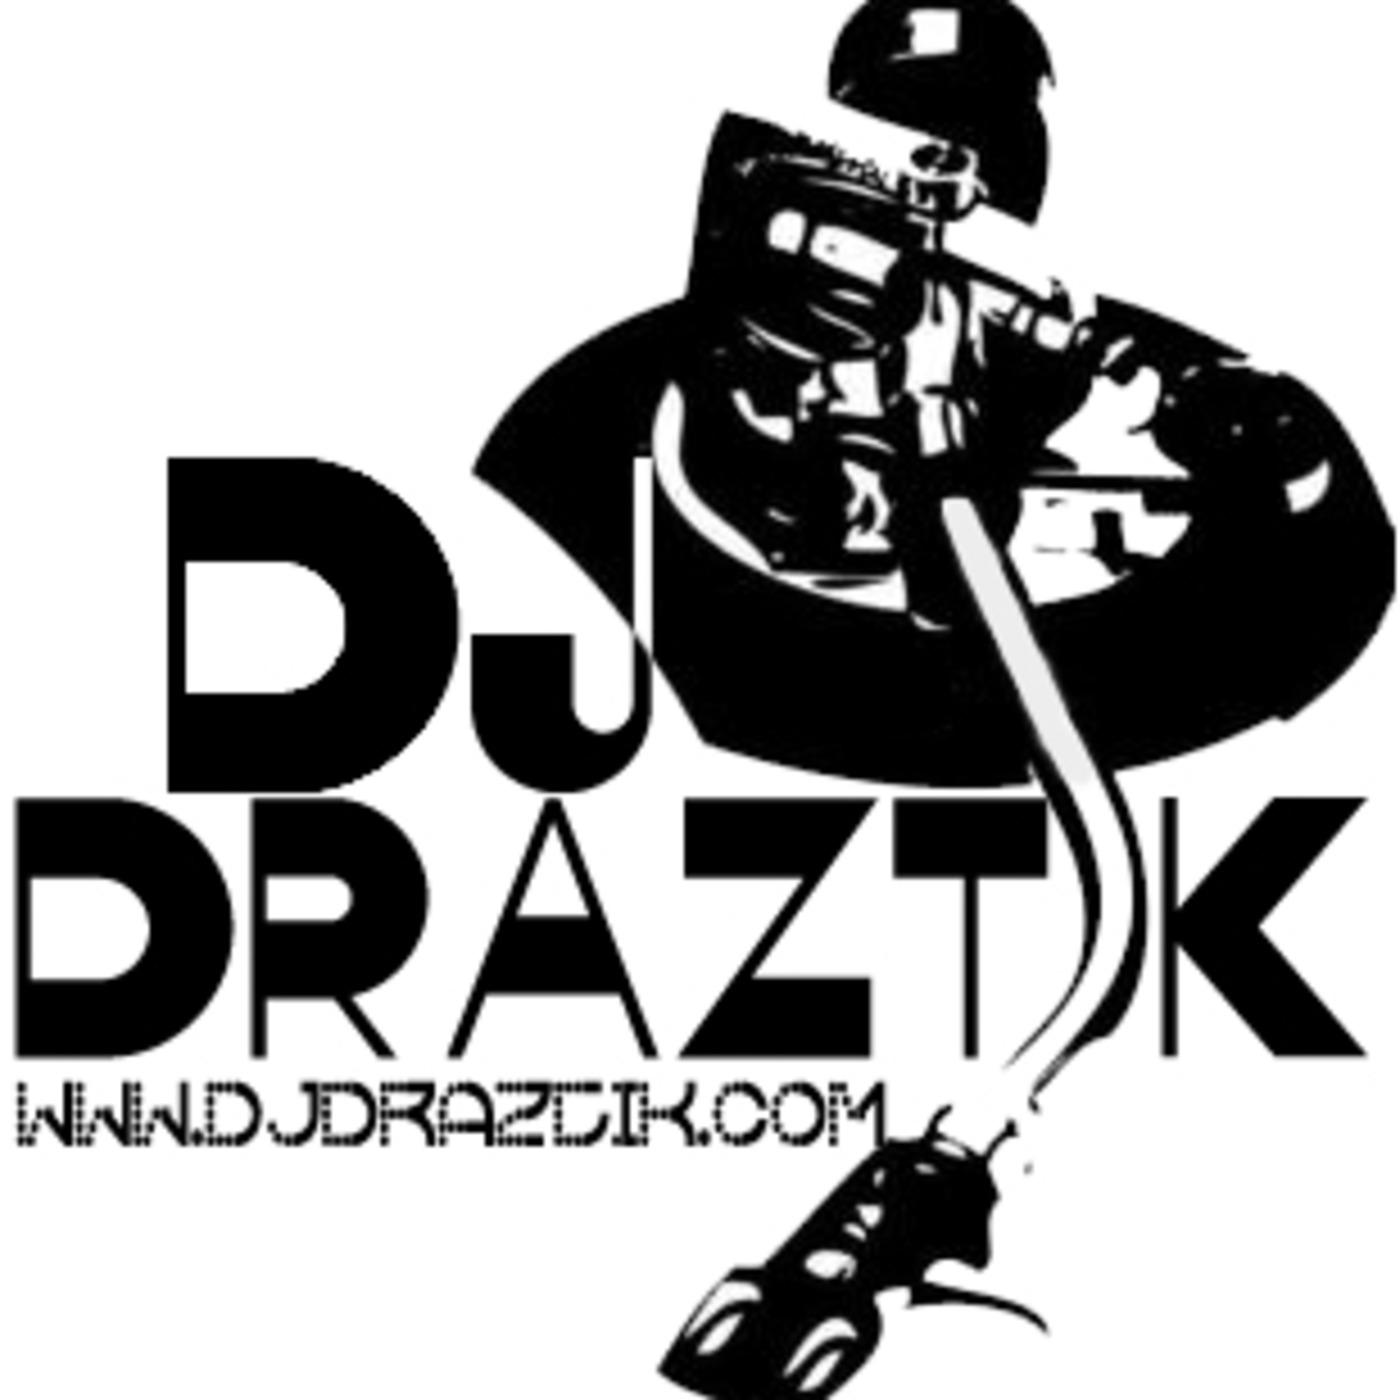 DJ Draztik Podcast